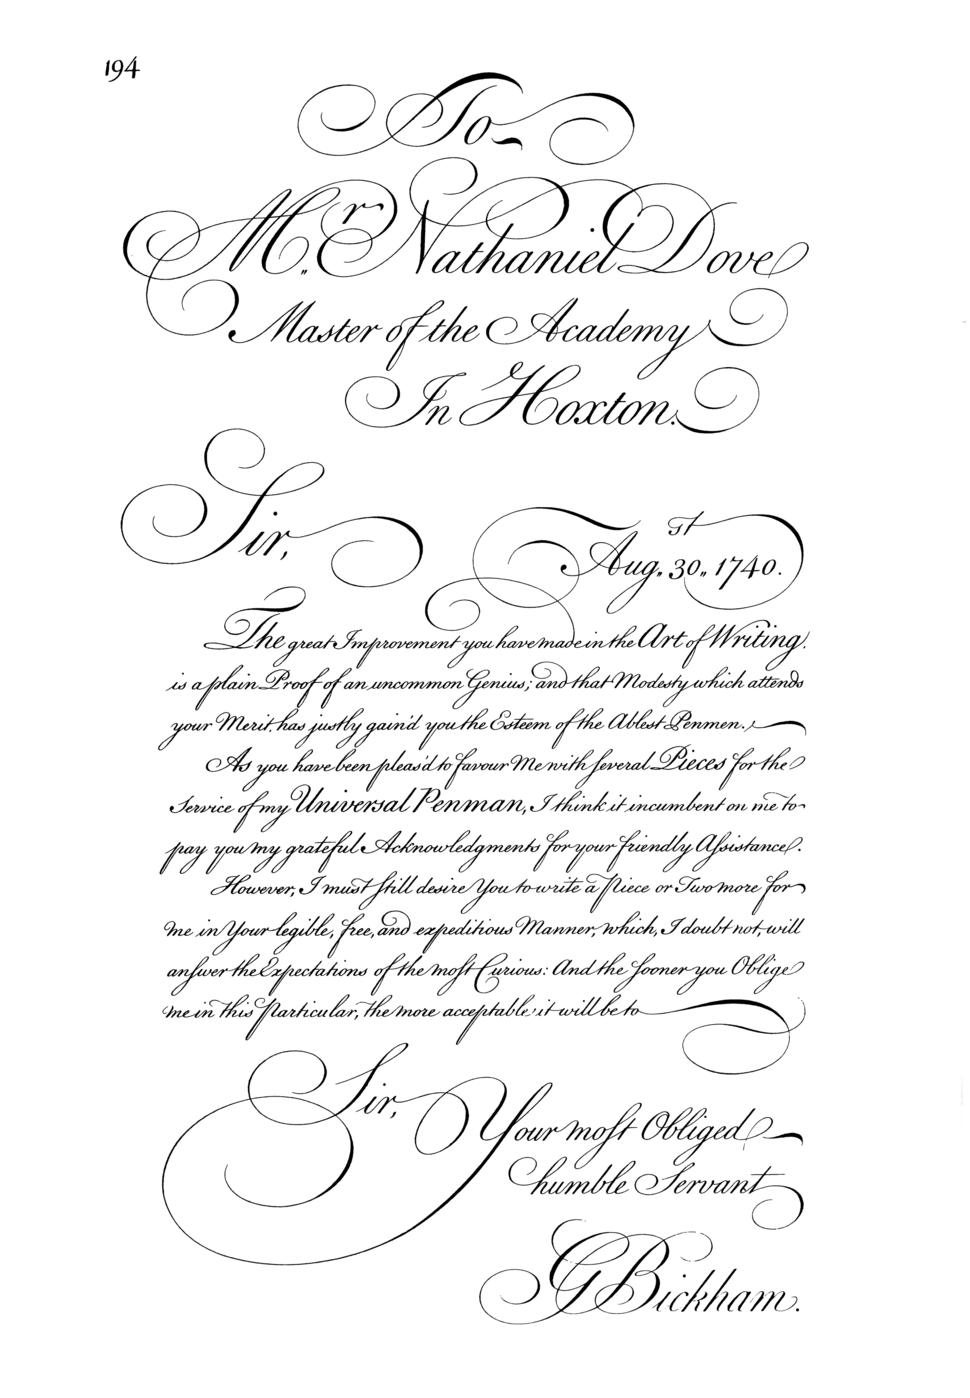 Bickham-letter